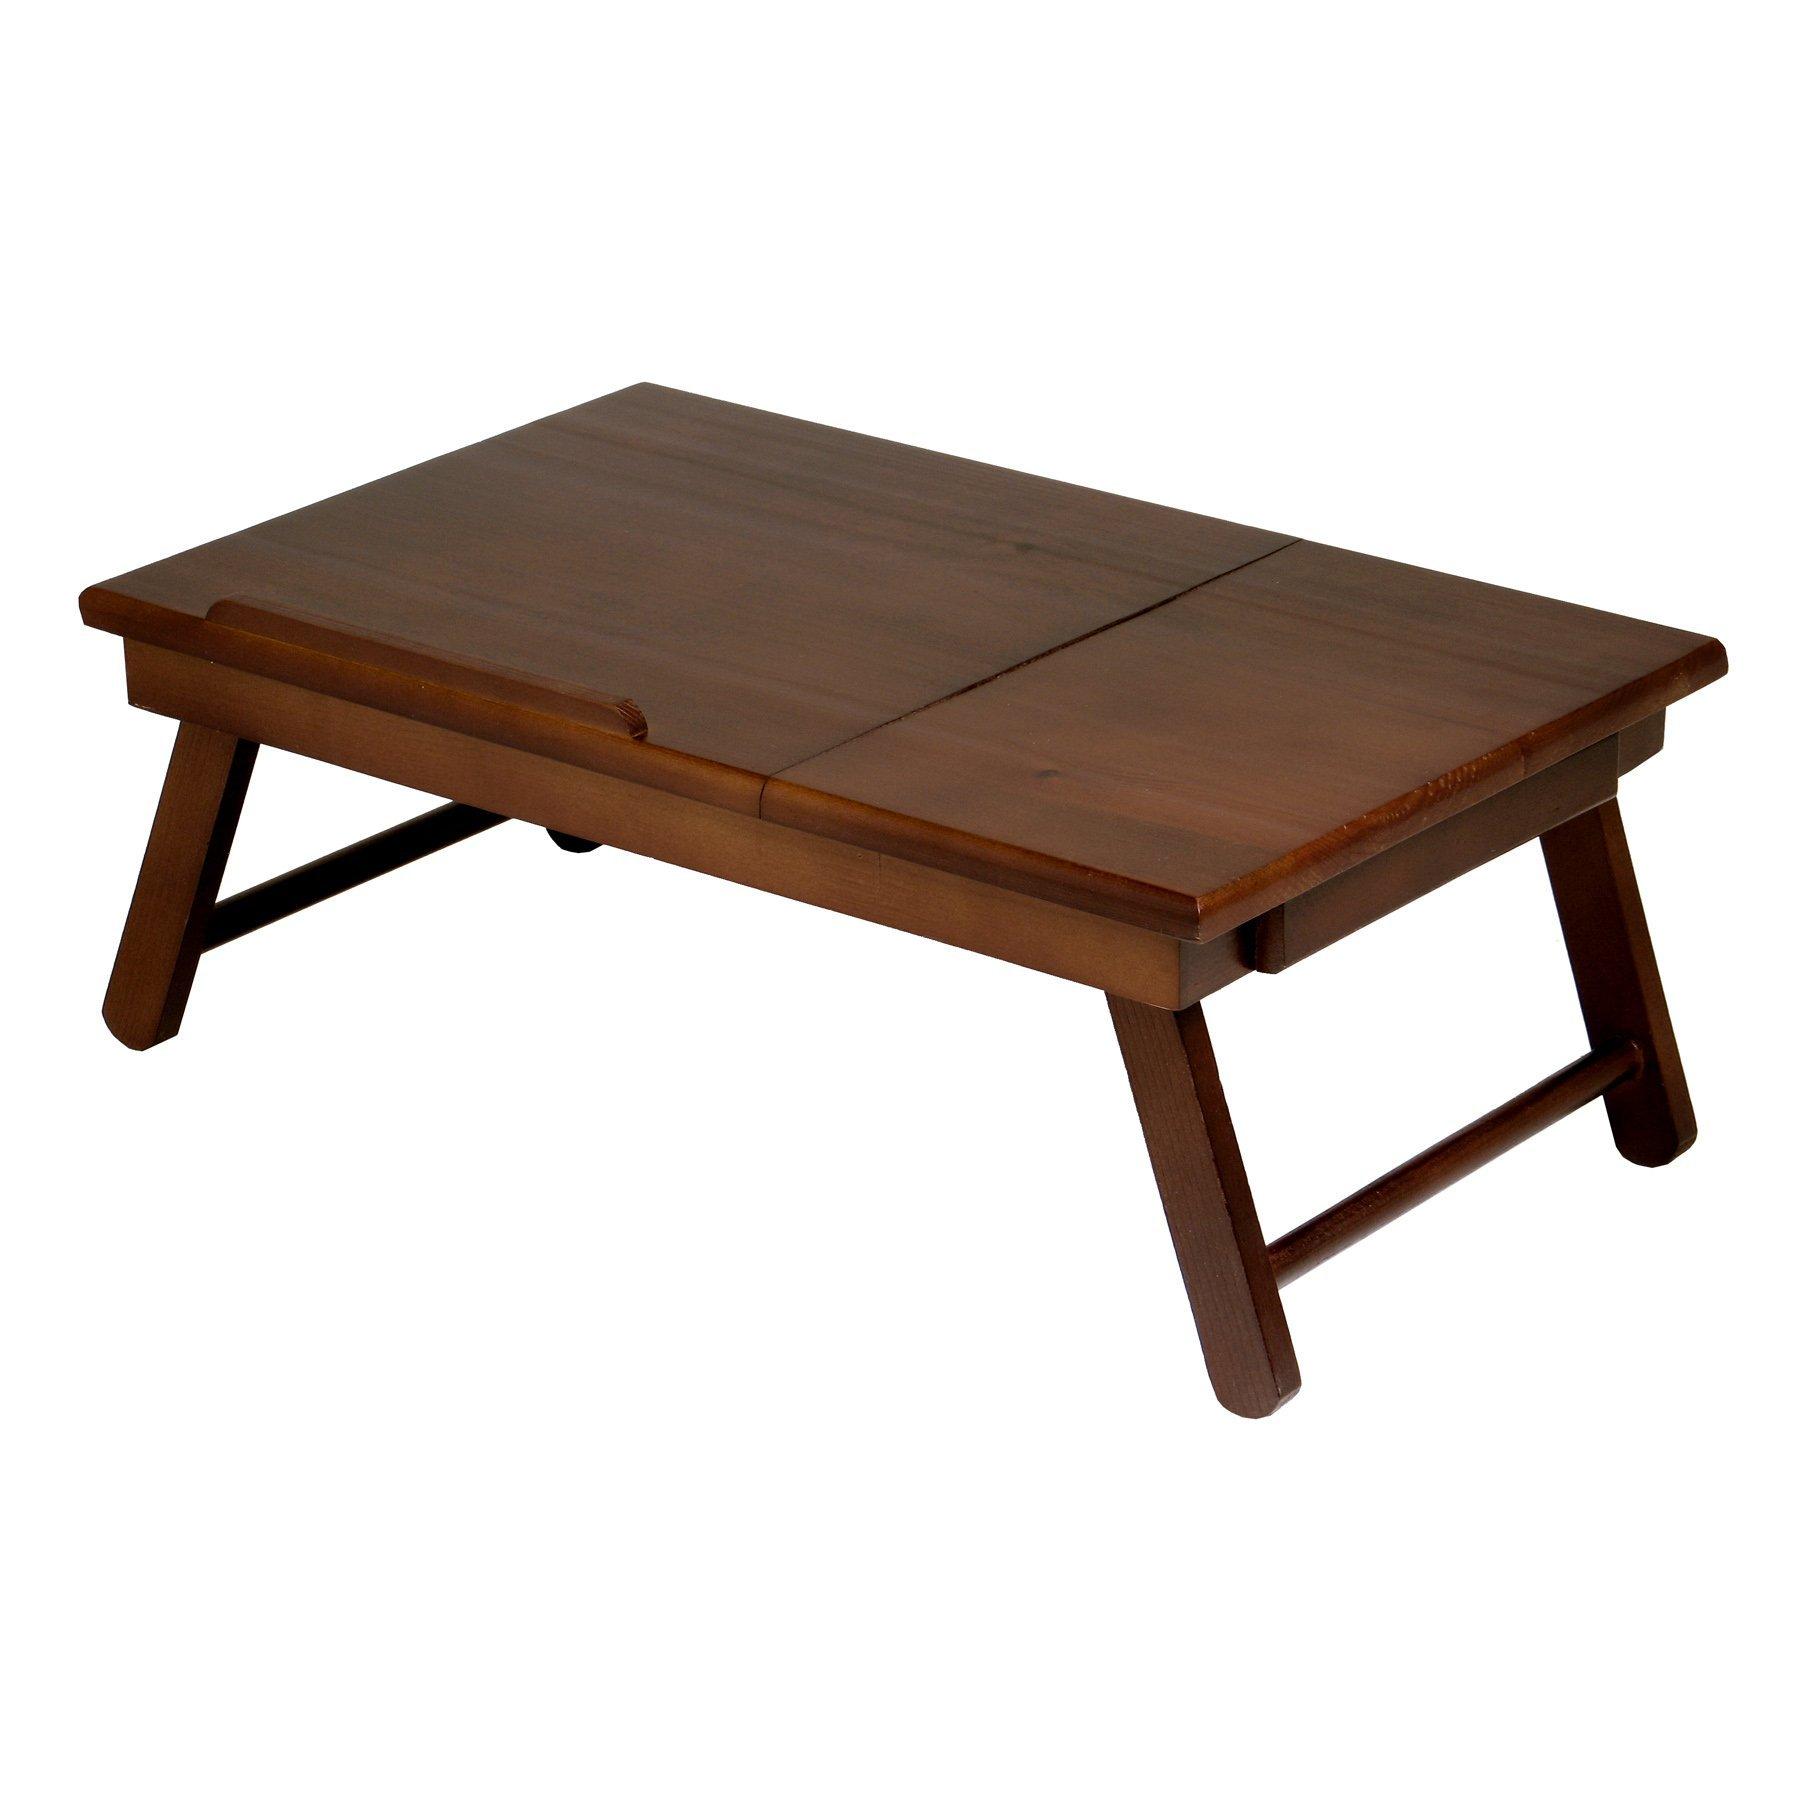 Winsome Wood 94623 Alden Bed Tray Walnut (Renewed)